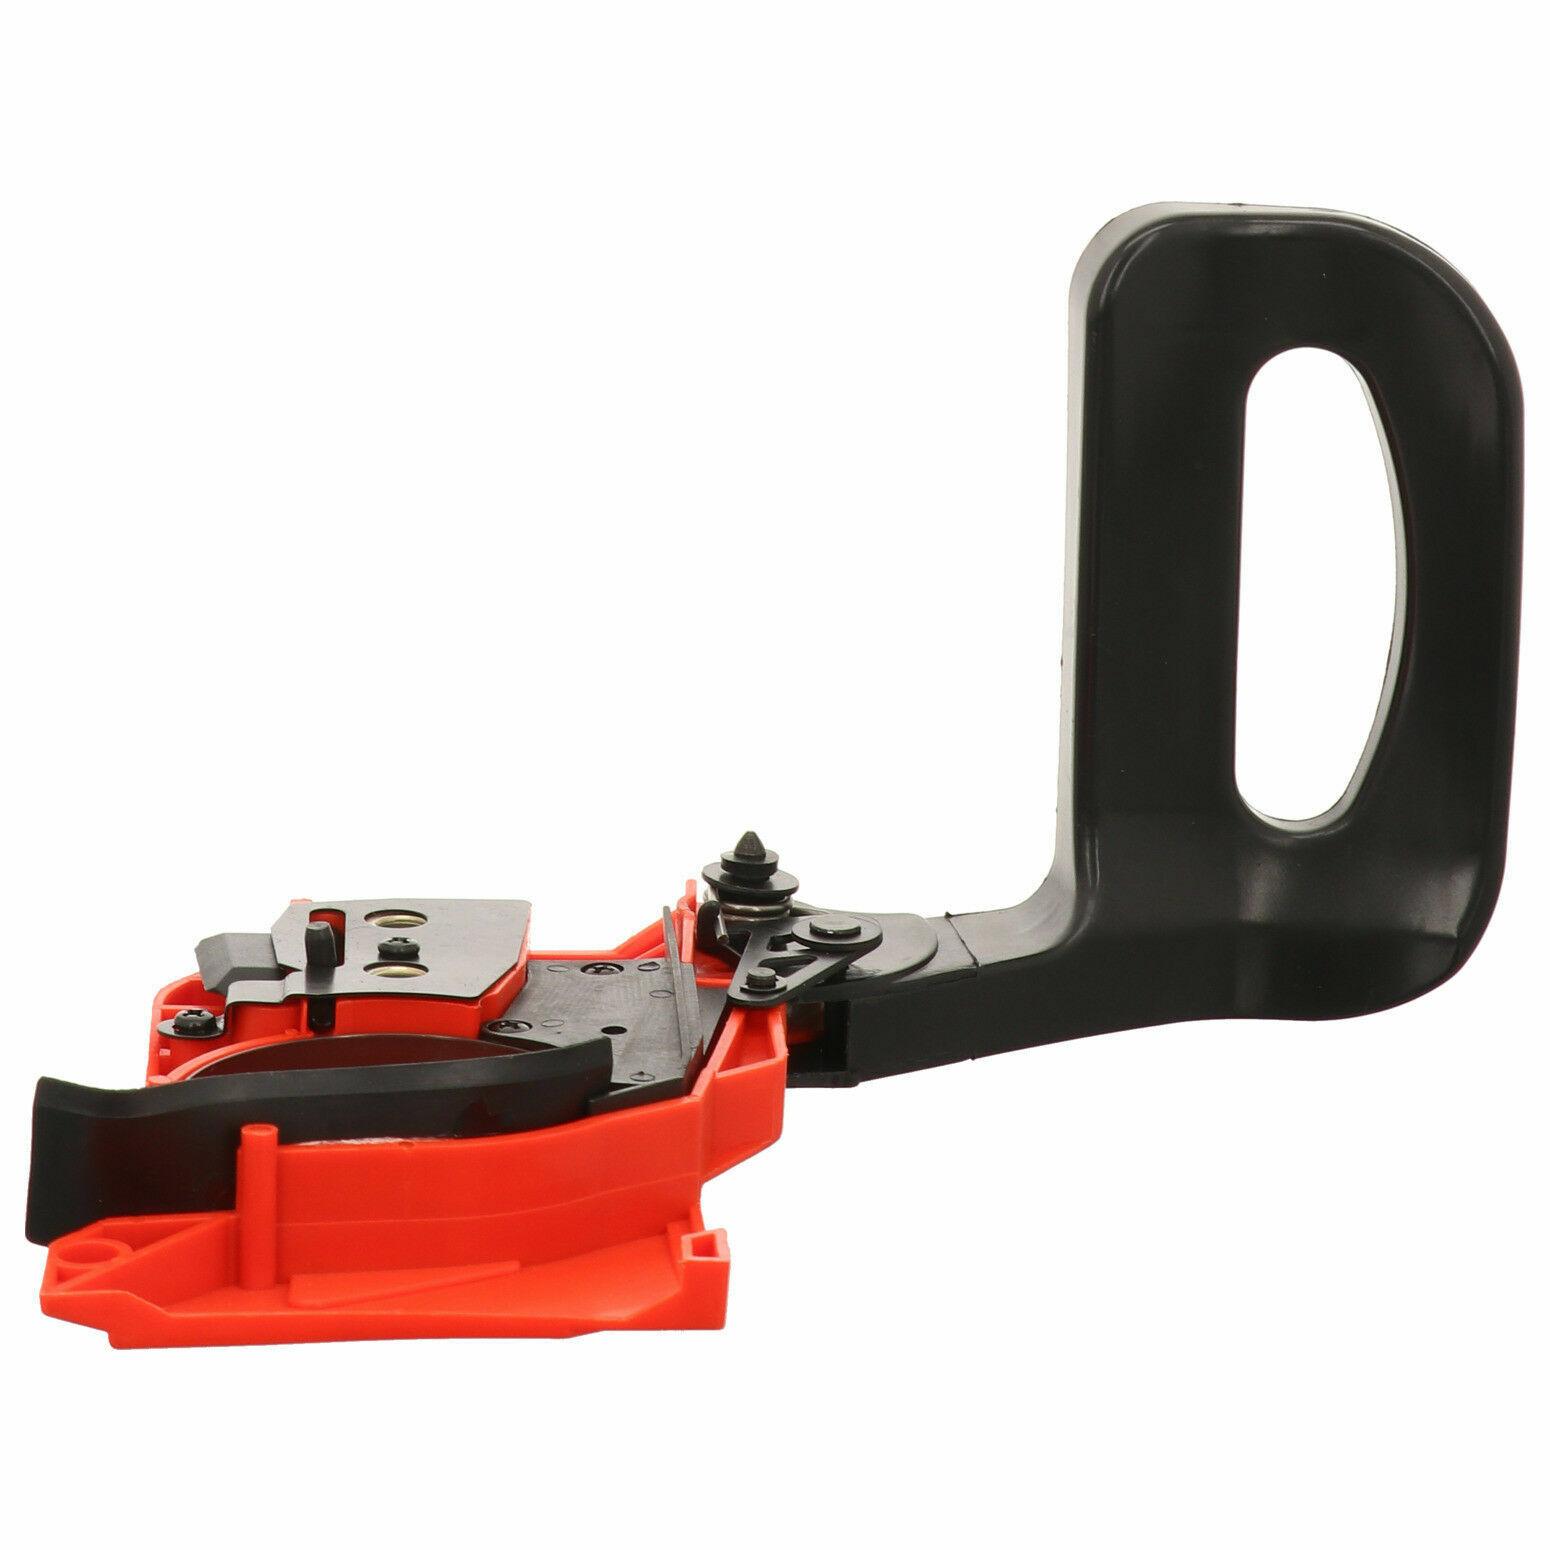 Bremshebel passend Fuxtec CS6150 Motorsäge